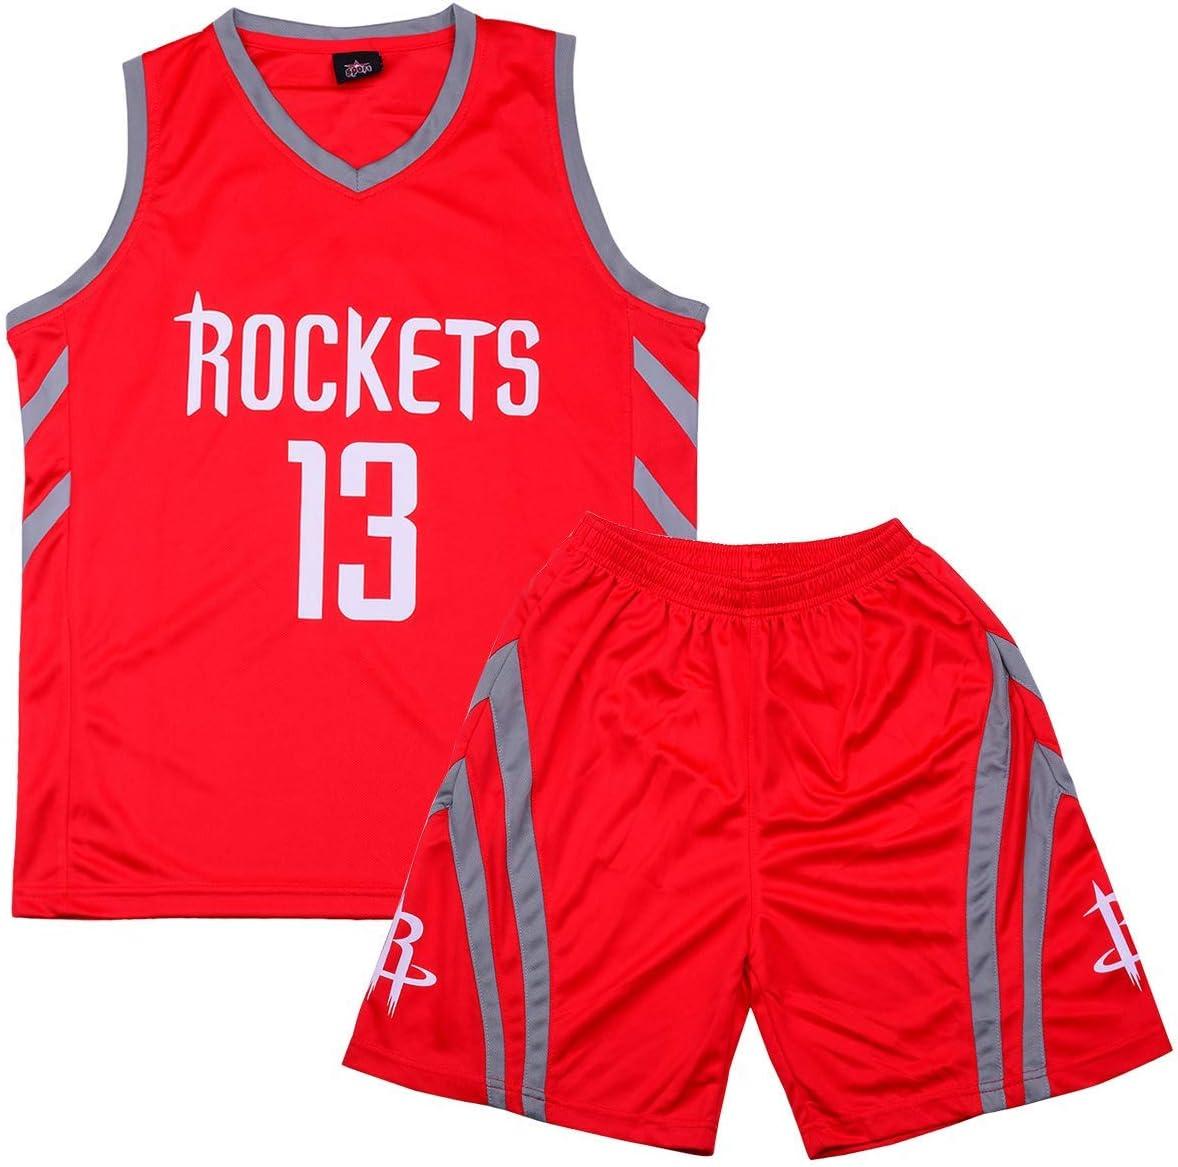 Formesy Gar/çon Fille Basket Maillots Lakers James#23 Harden#13 Boston#11 Basketball Jersey T-Shirt et Short Sportwear Ensemble pour Enfant Teenager